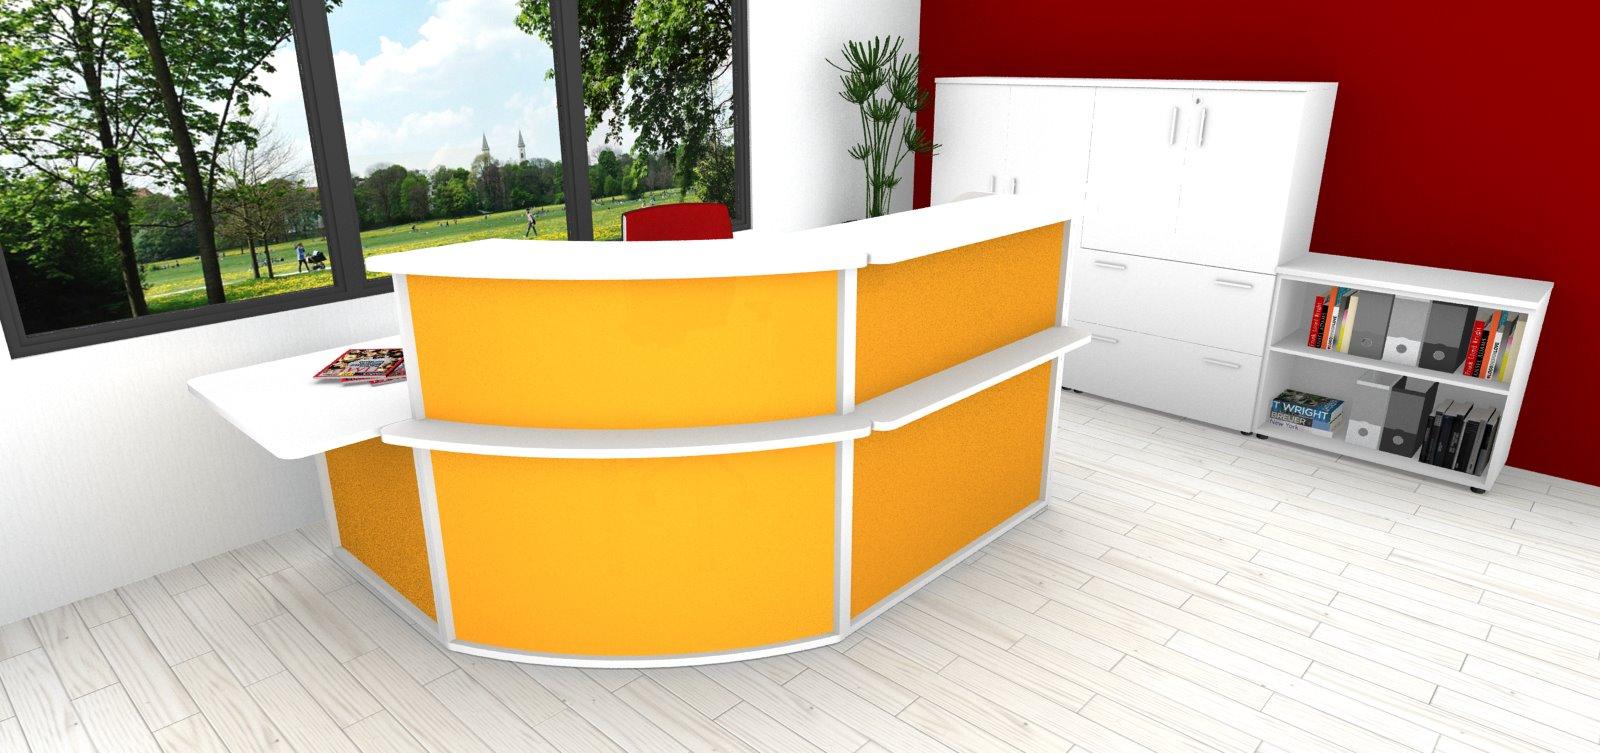 banque d 39 accueil el gance achat banques d 39 accueil. Black Bedroom Furniture Sets. Home Design Ideas